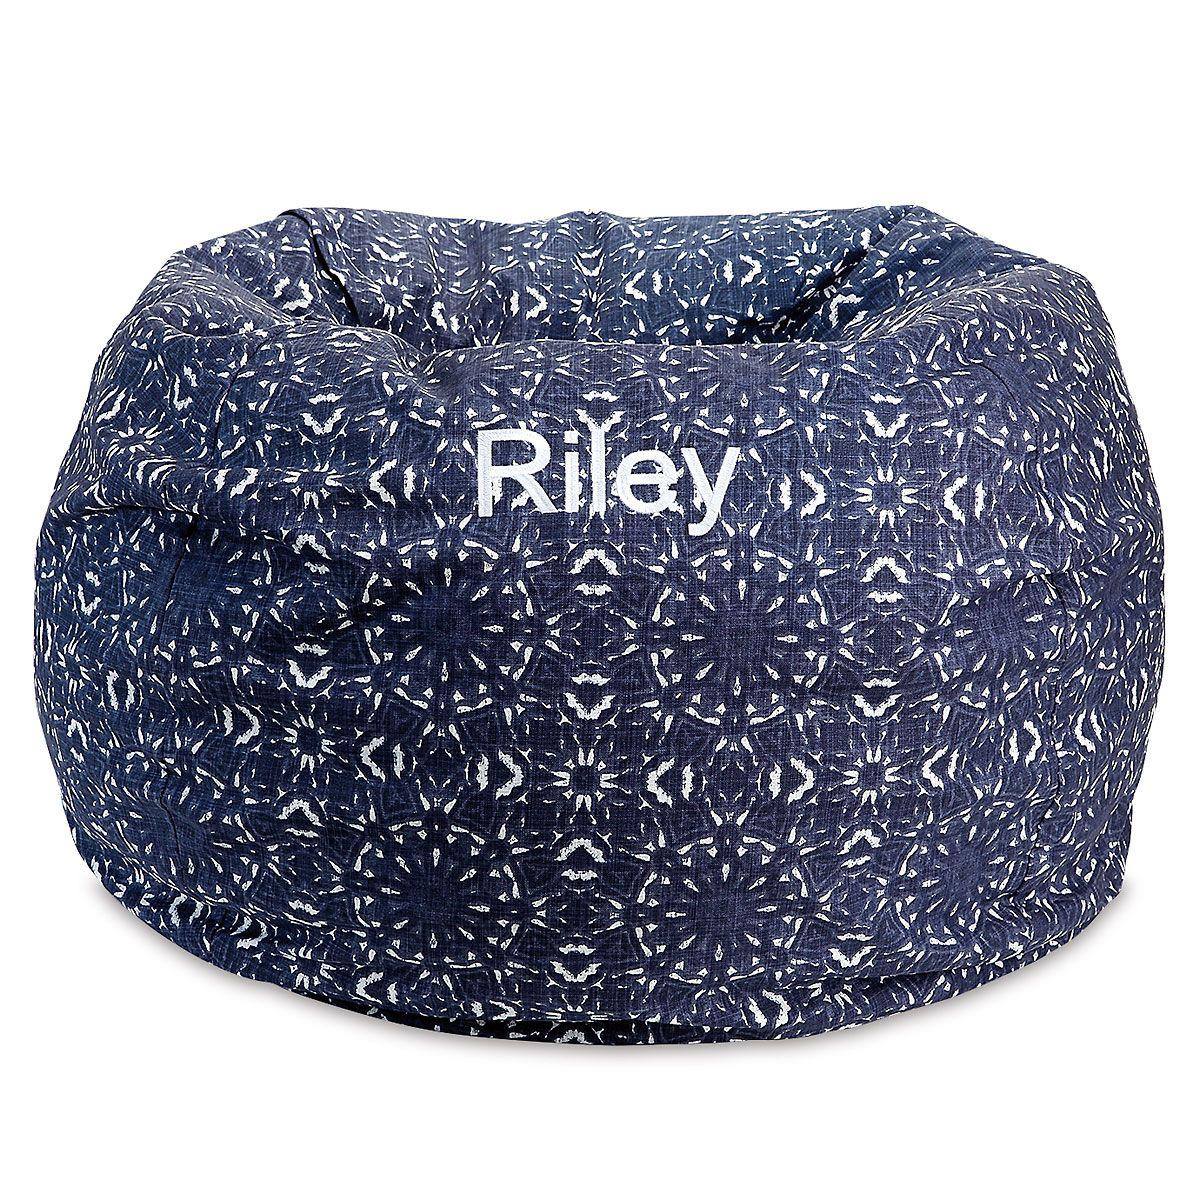 Personalized Blue Kaleidoscope Bean Bag Chair